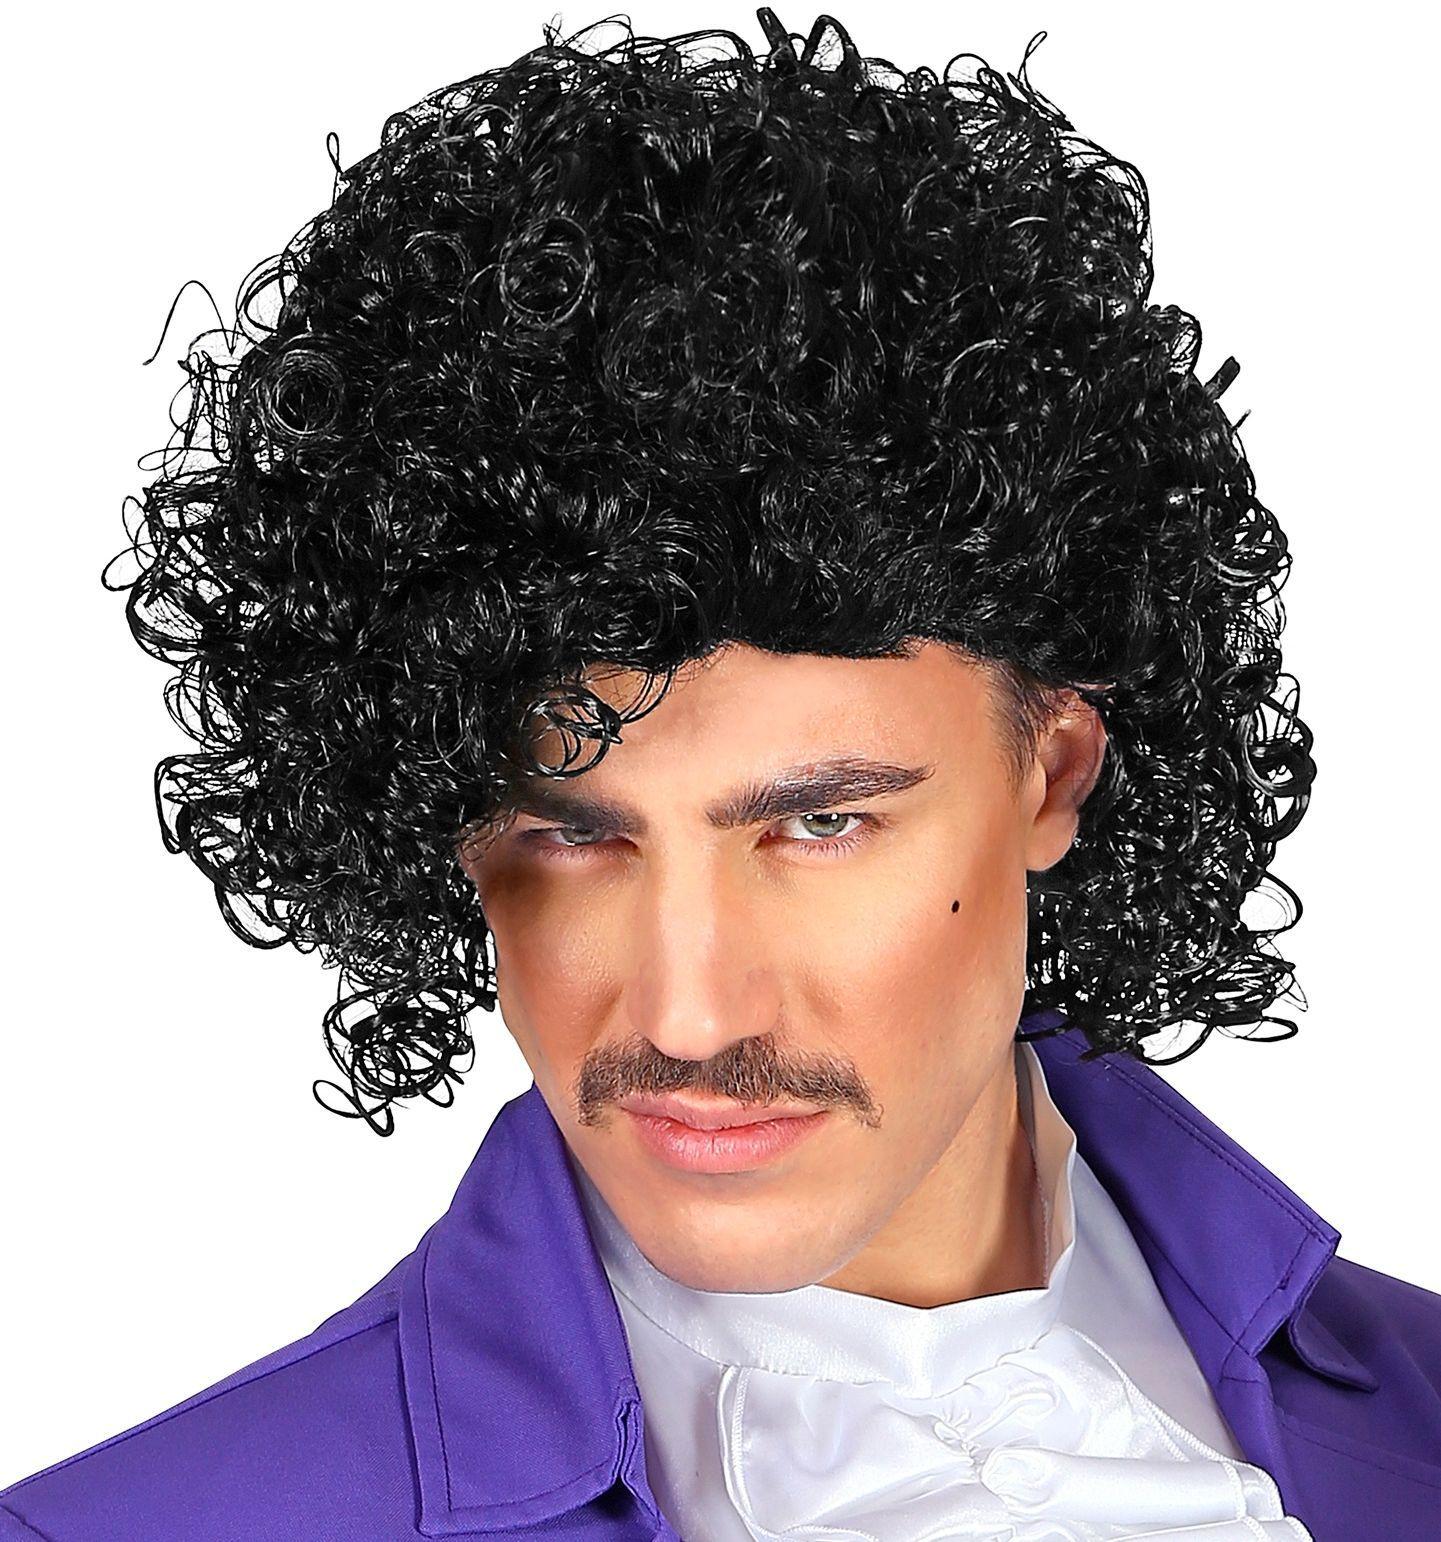 Zwarte Prince pruik